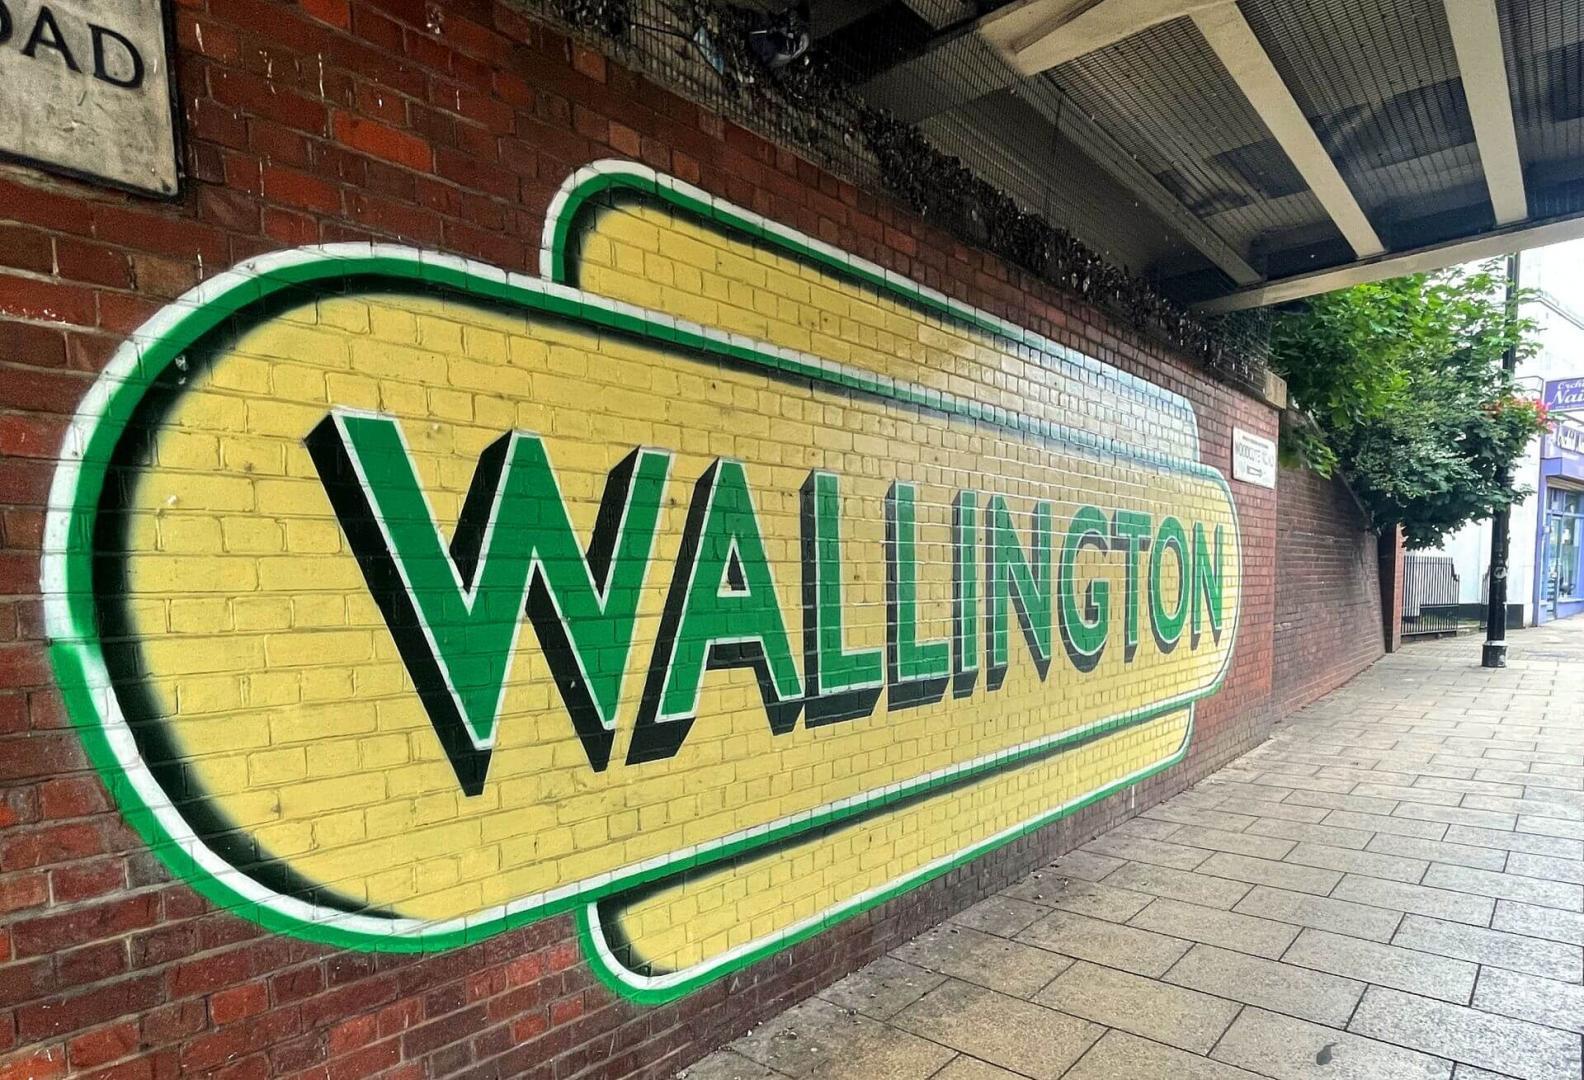 Area Guide for Wallington